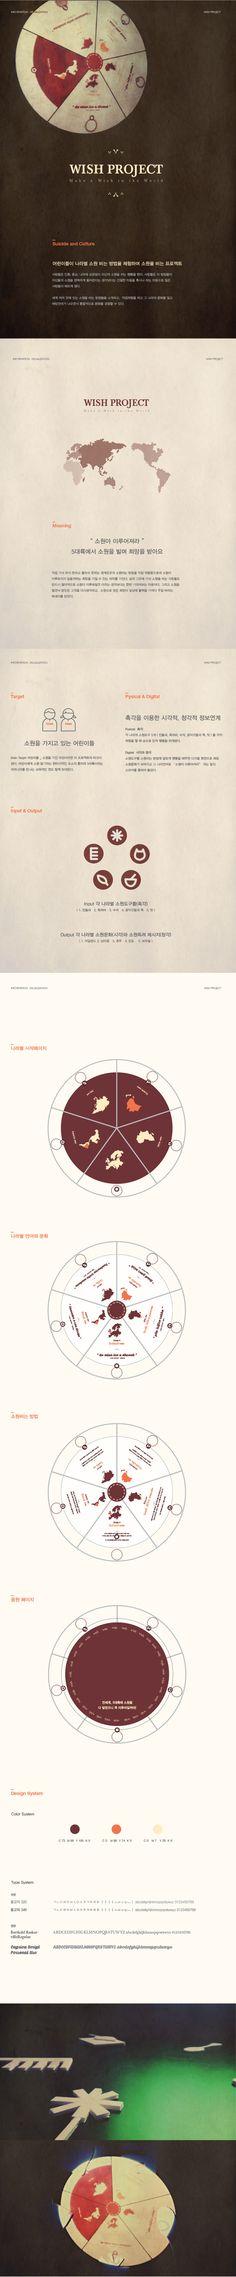 Minjoo Jea│ Information Visualization 2015│ Major in Digital Media Design │#hicoda │hicoda.hongik.ac.kr